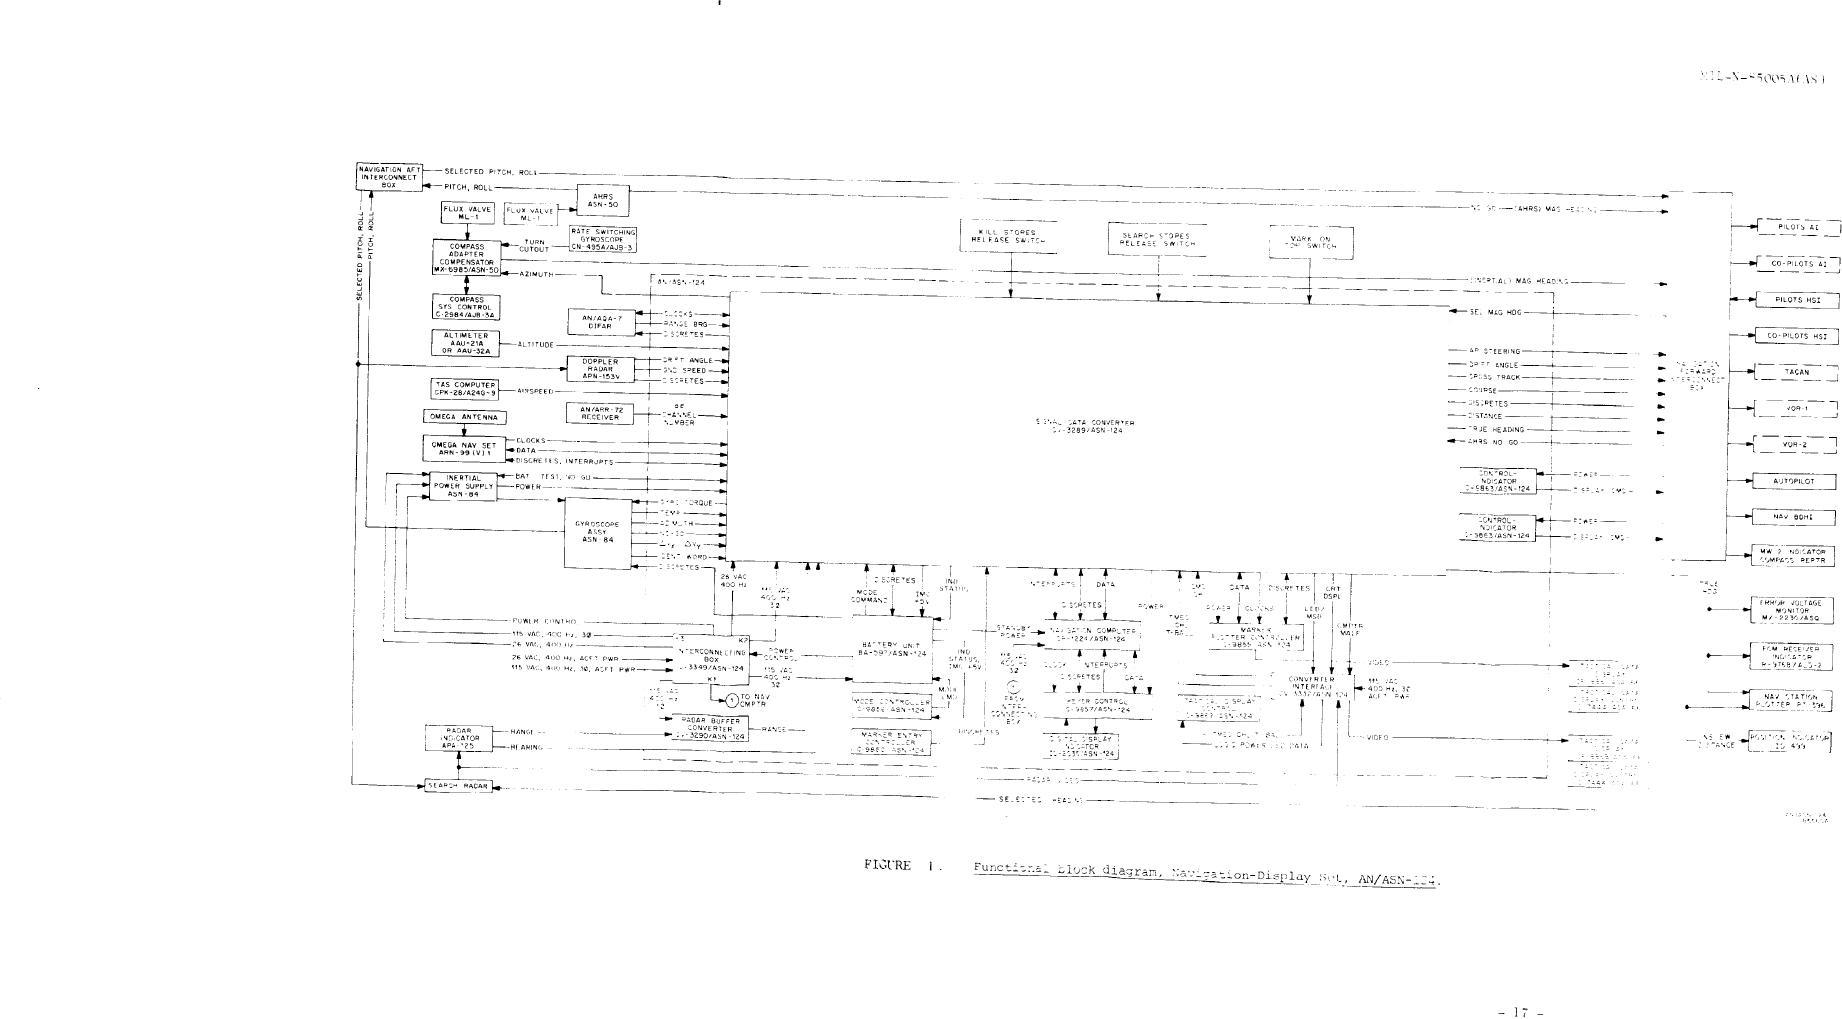 Figure 1 Functional Block Diagram Navigation Display Set